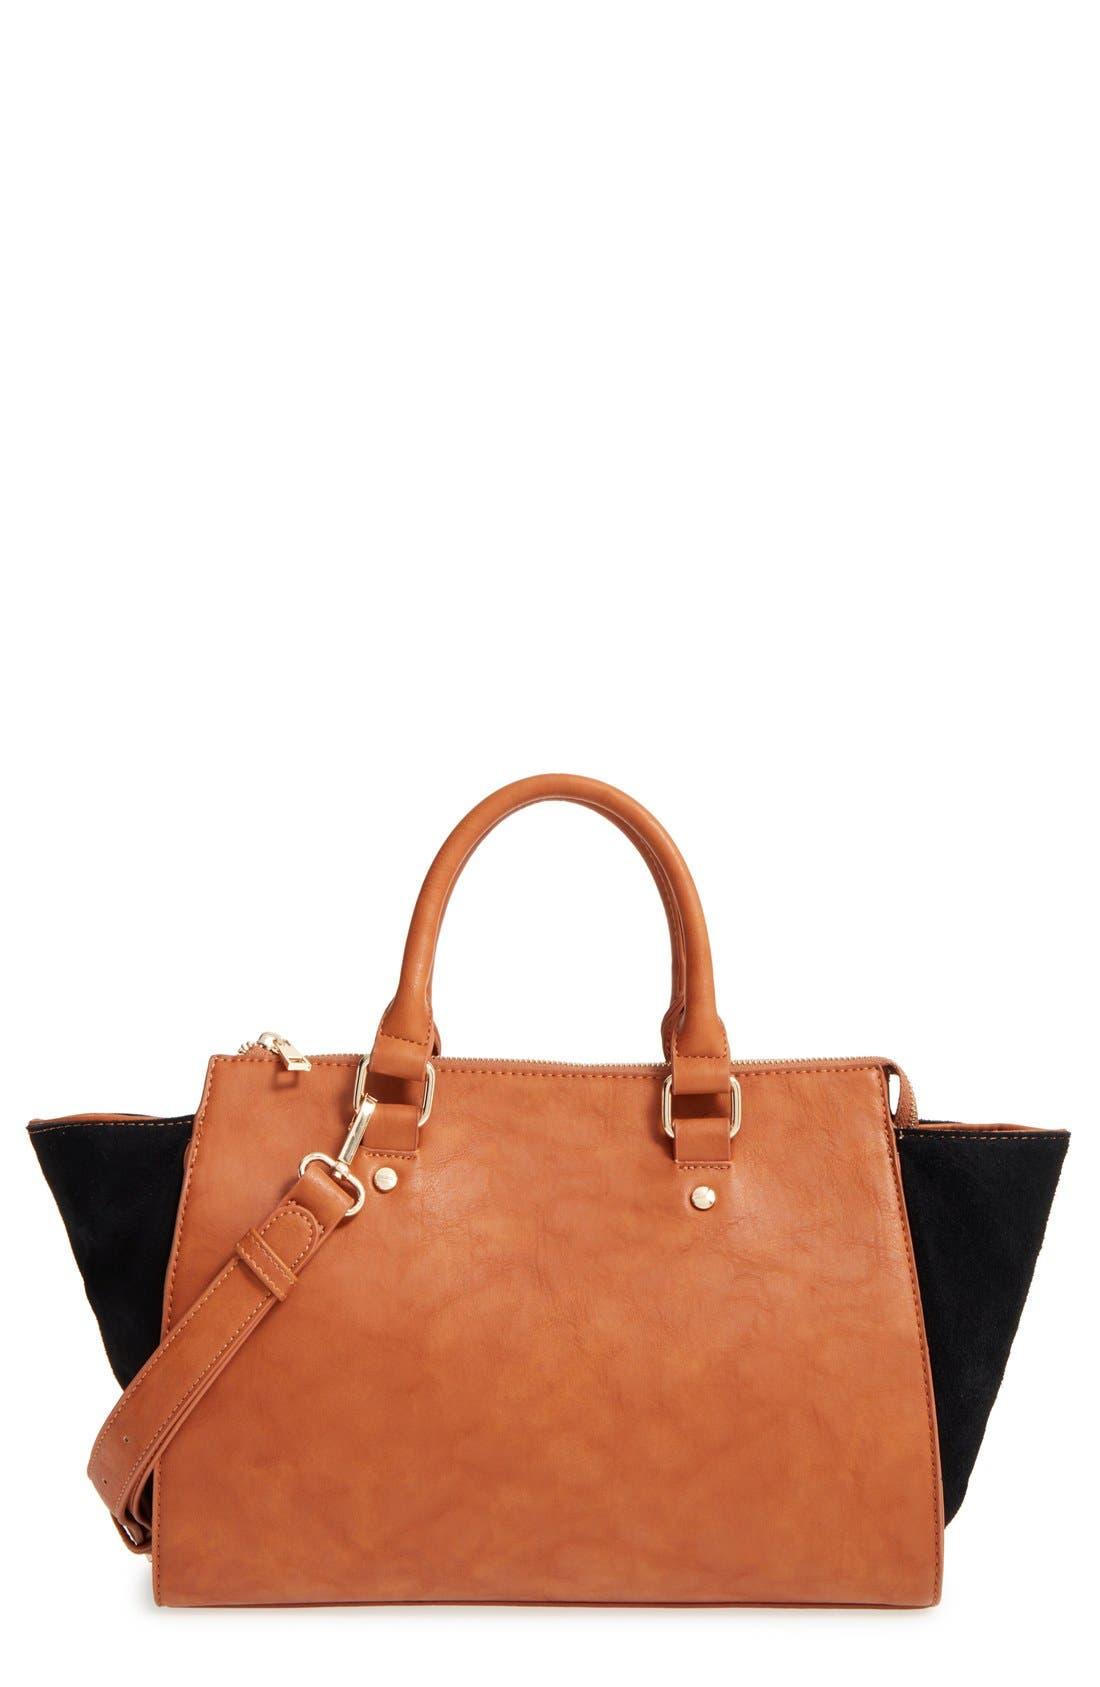 Main Image - Sole Society 'Bridgette' Winged Faux Leather & Faux Suede Satchel